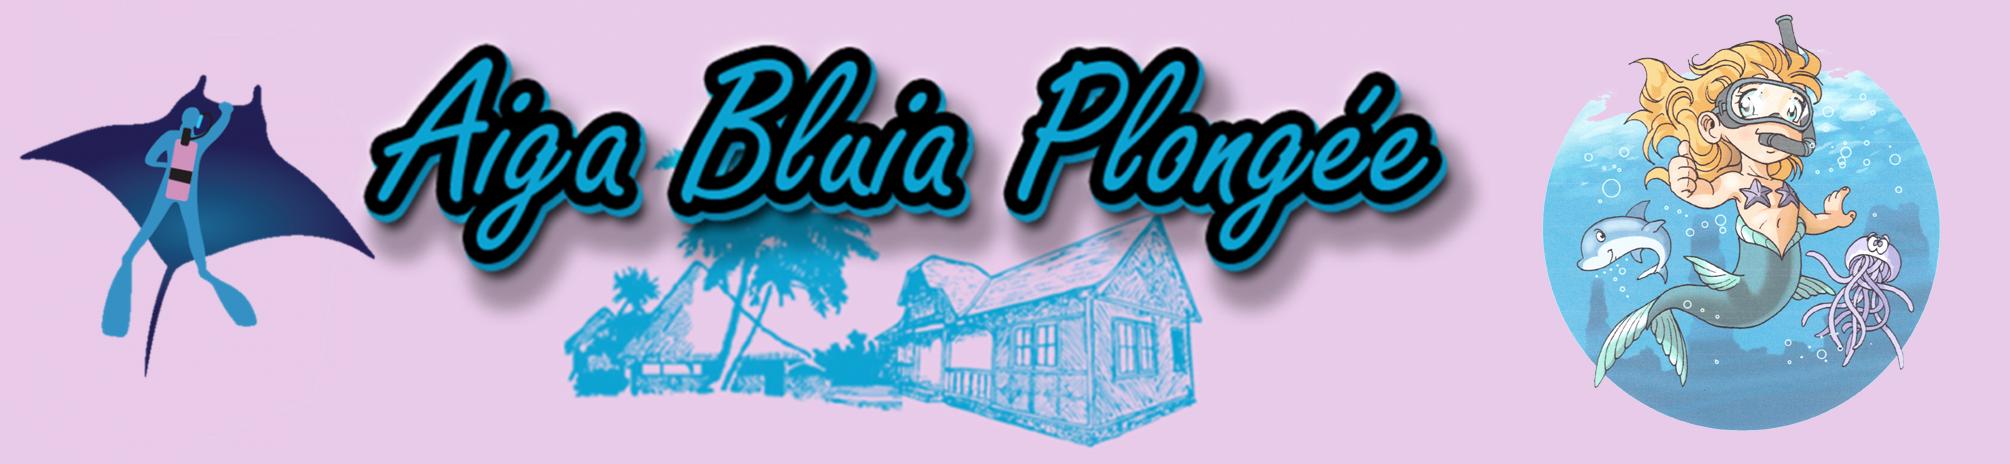 Aiga Bluia Plongée 87